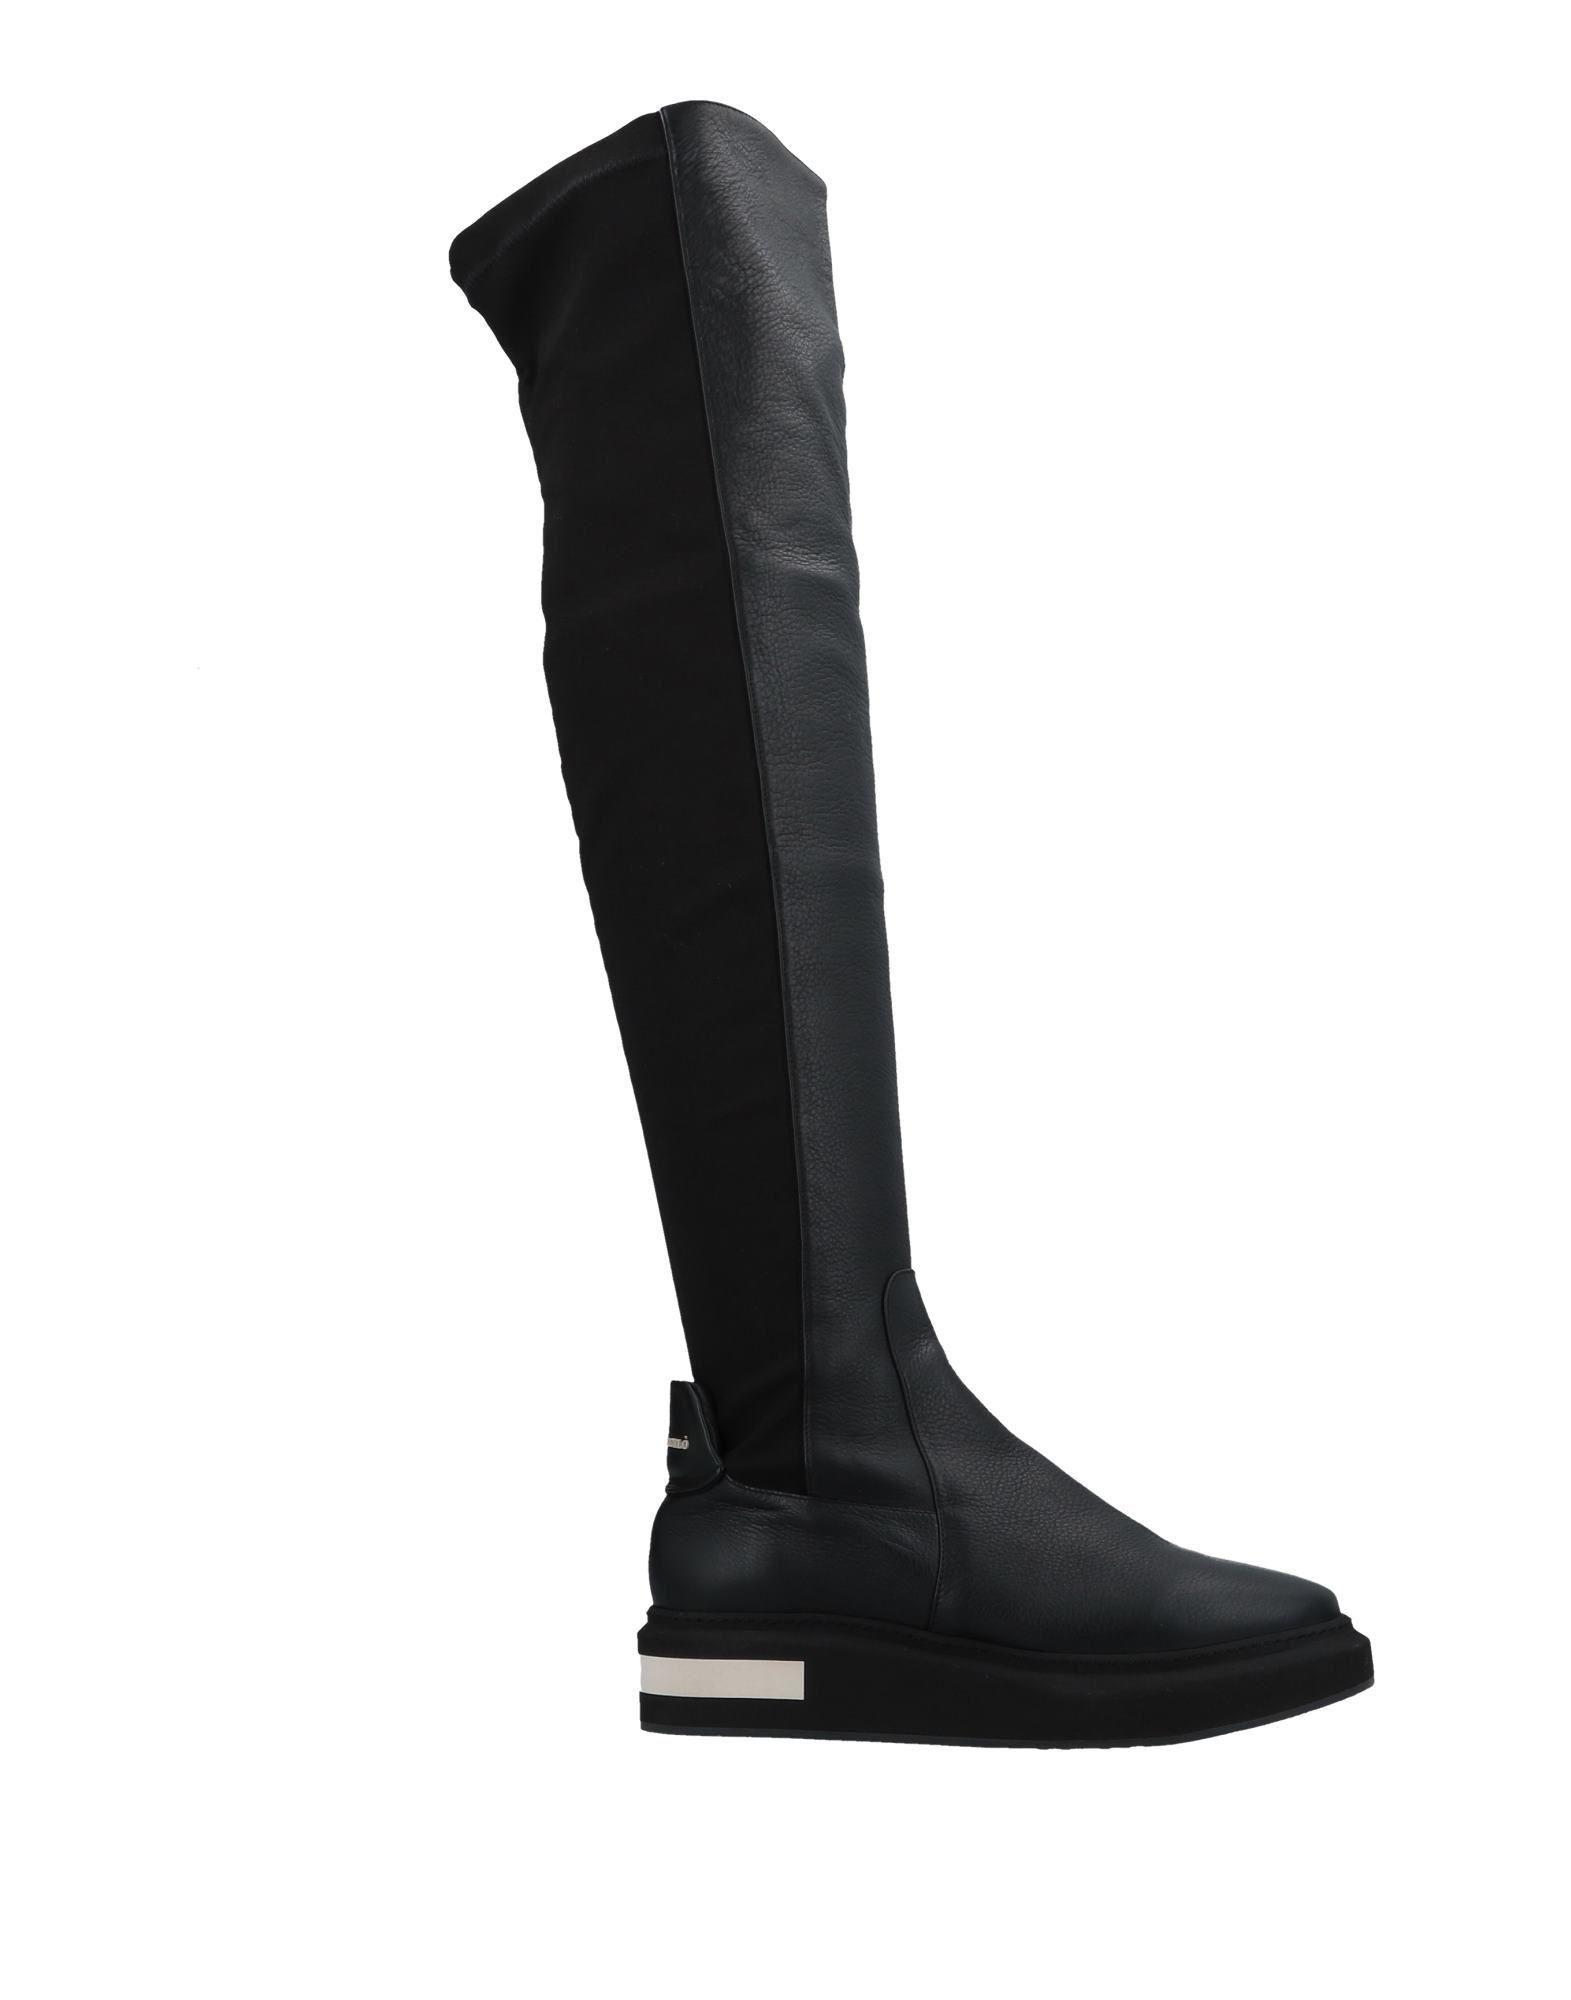 Manuel Barceló Stiefel Damen  11512548WRGut aussehende strapazierfähige Schuhe